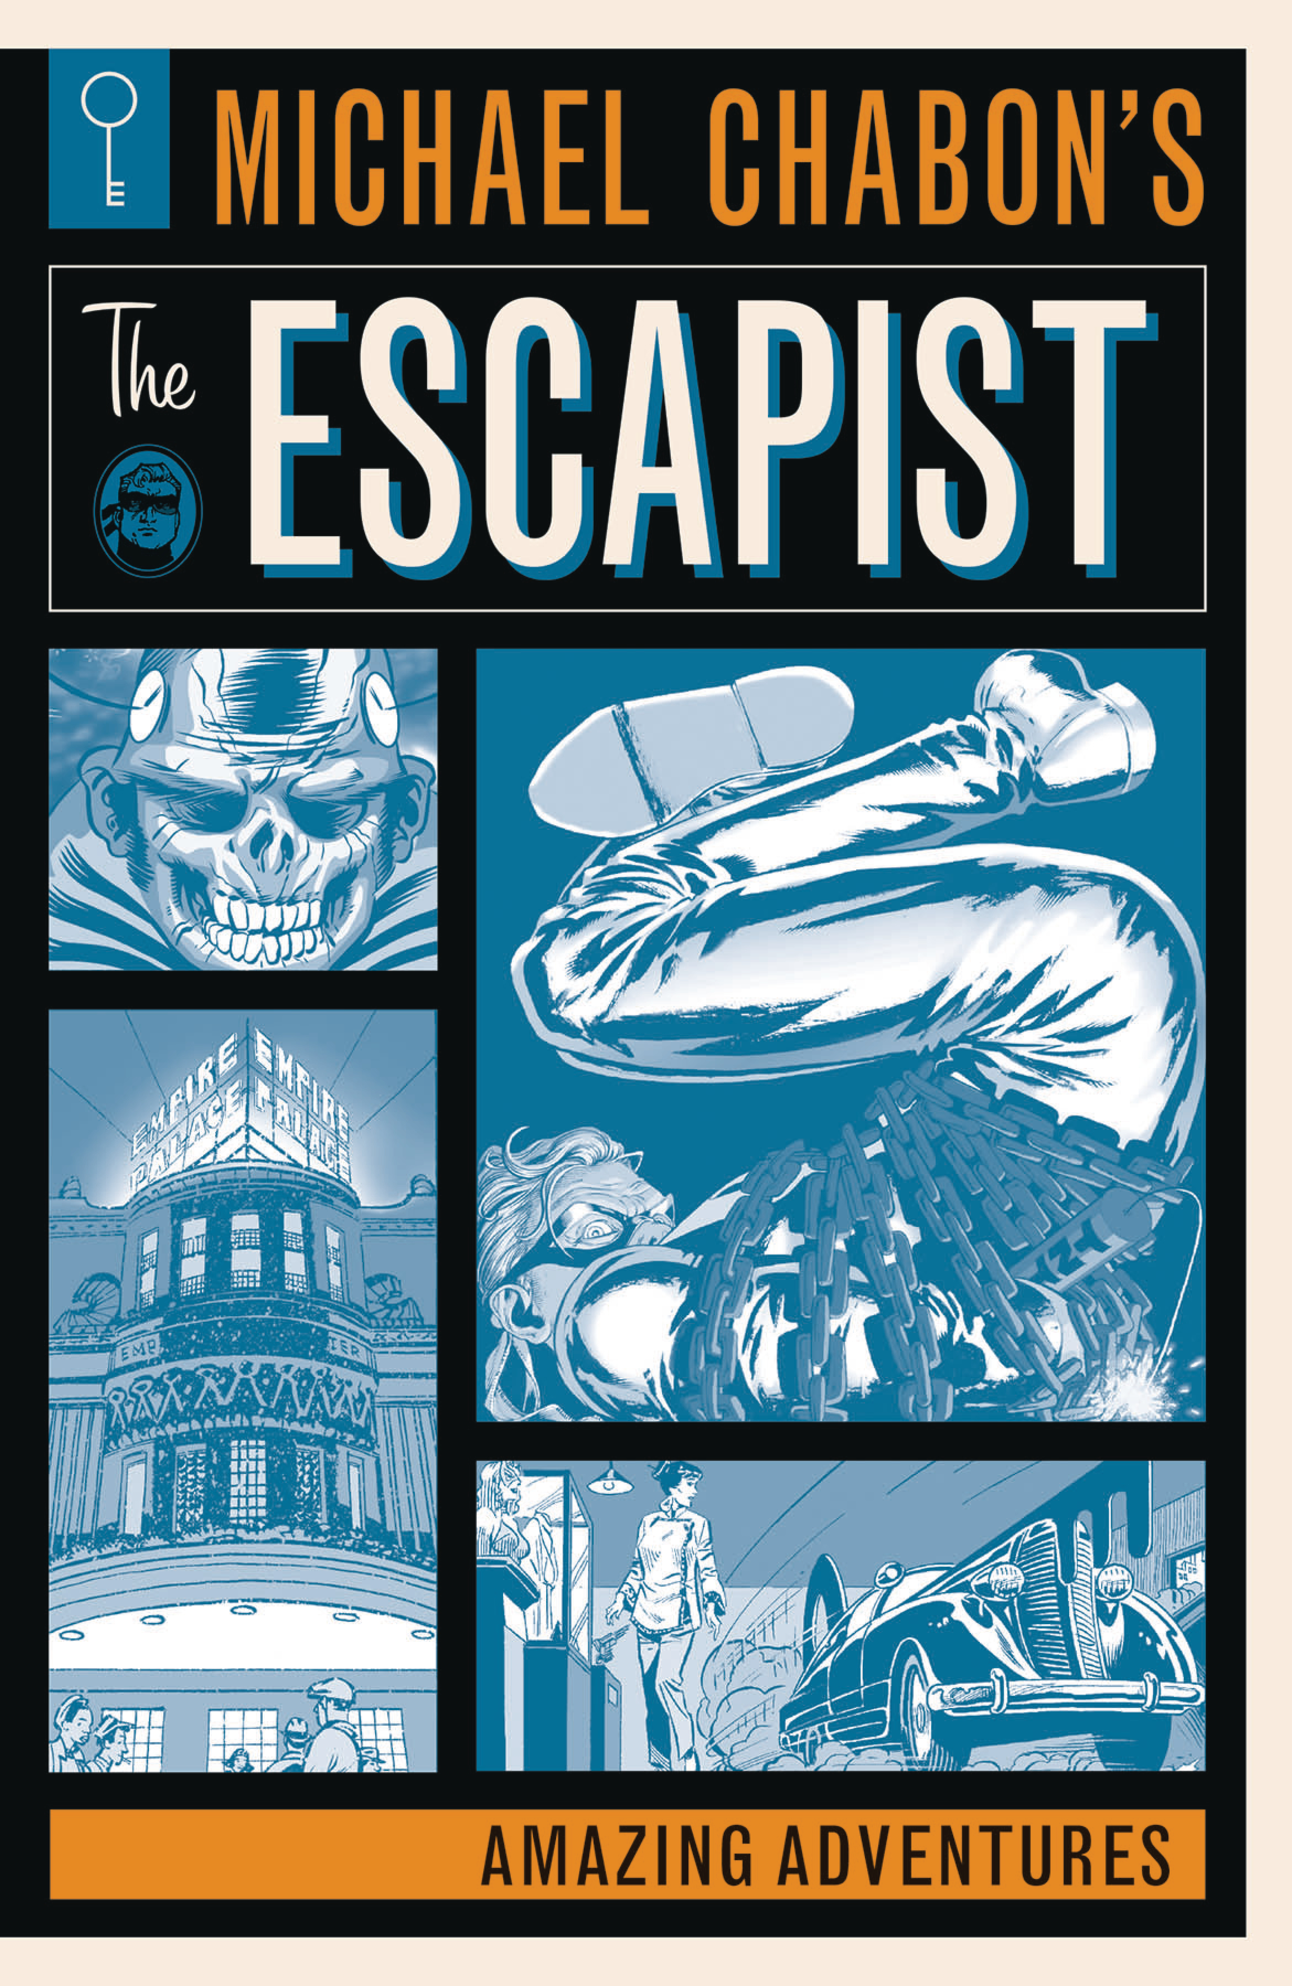 escapist amazing adventures.png